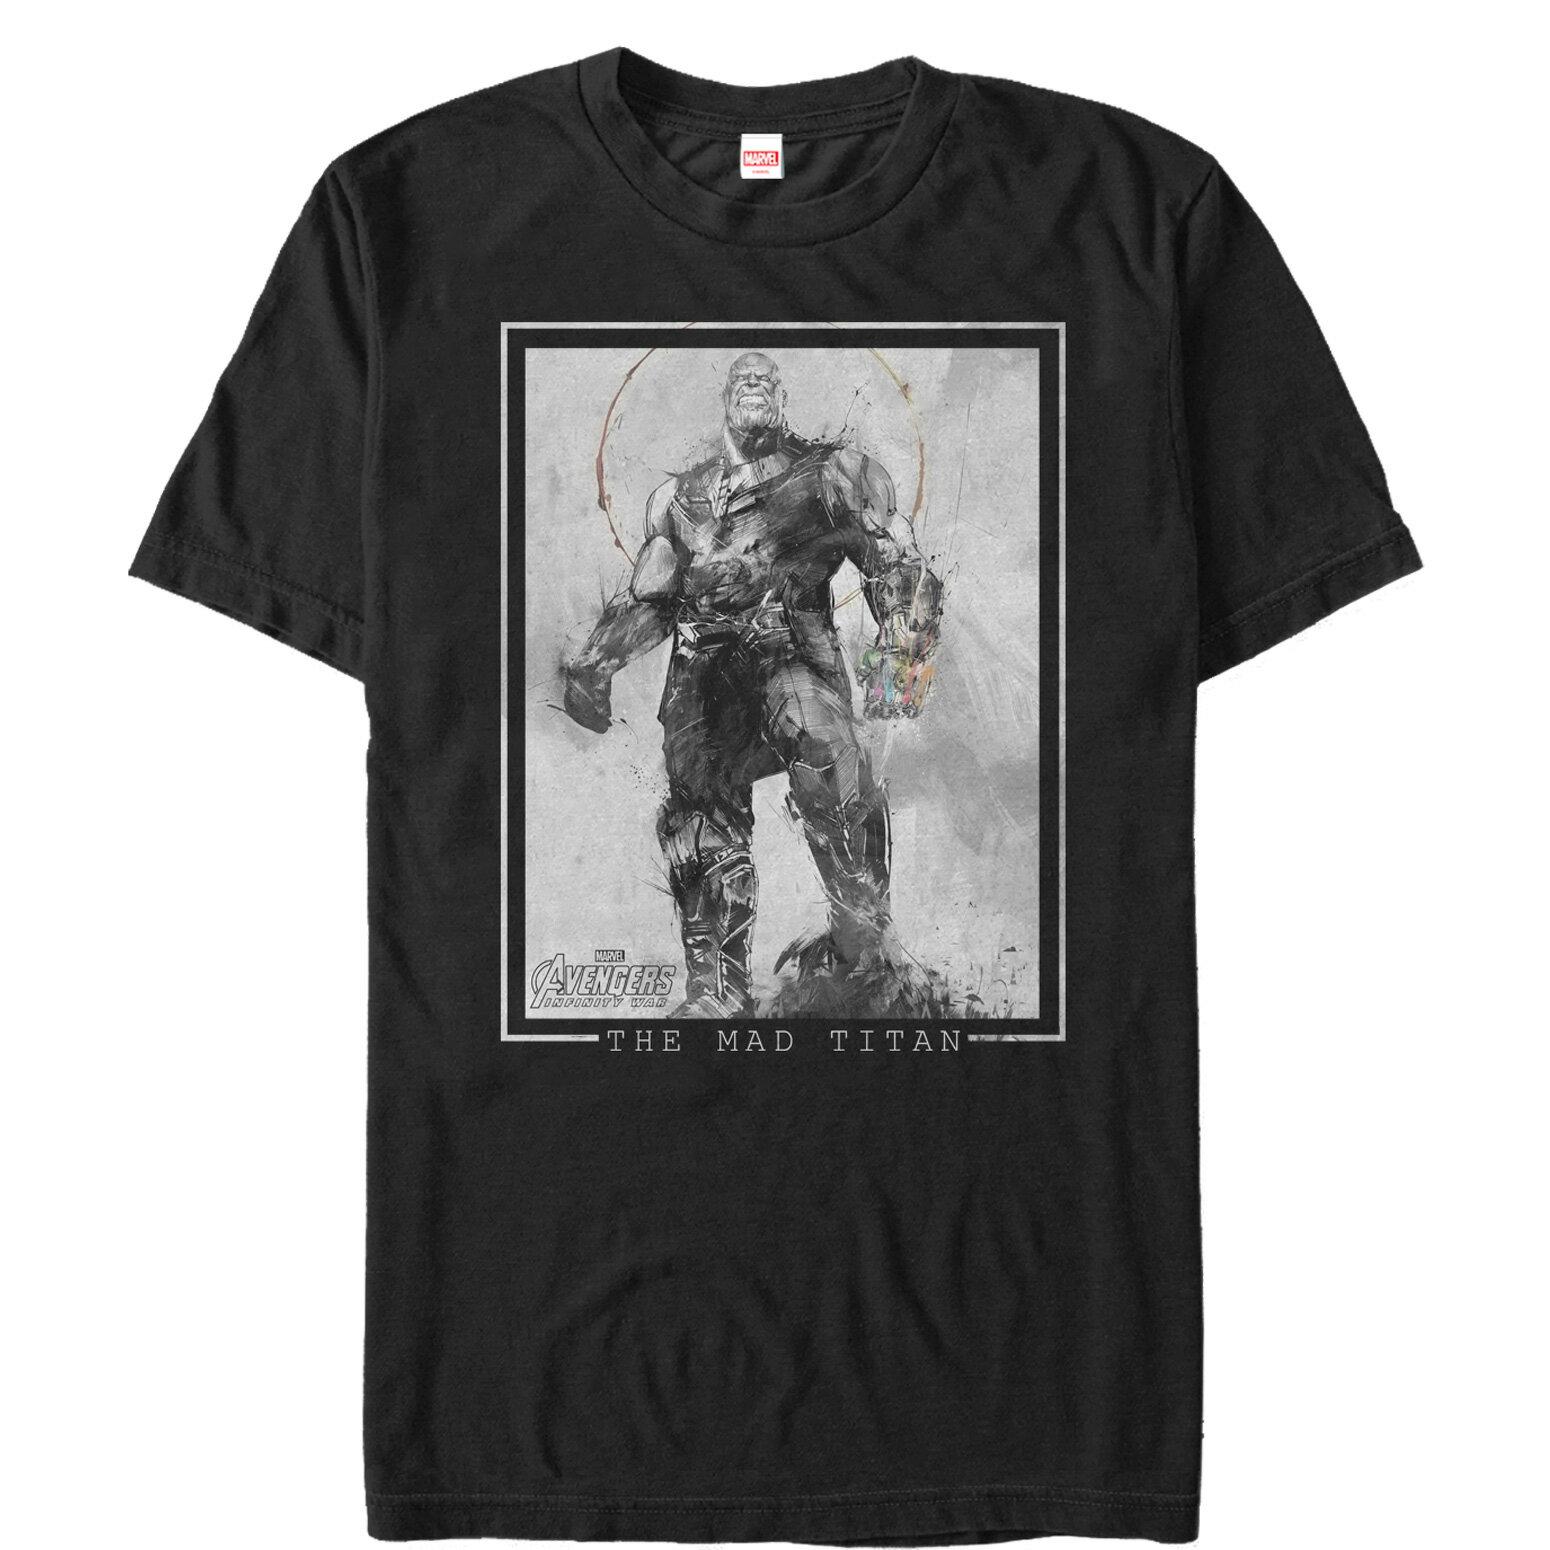 e3b47a6a Marvel Avengers: Infinity War Thanos Grayscale Mens Graphic T Shirt 0